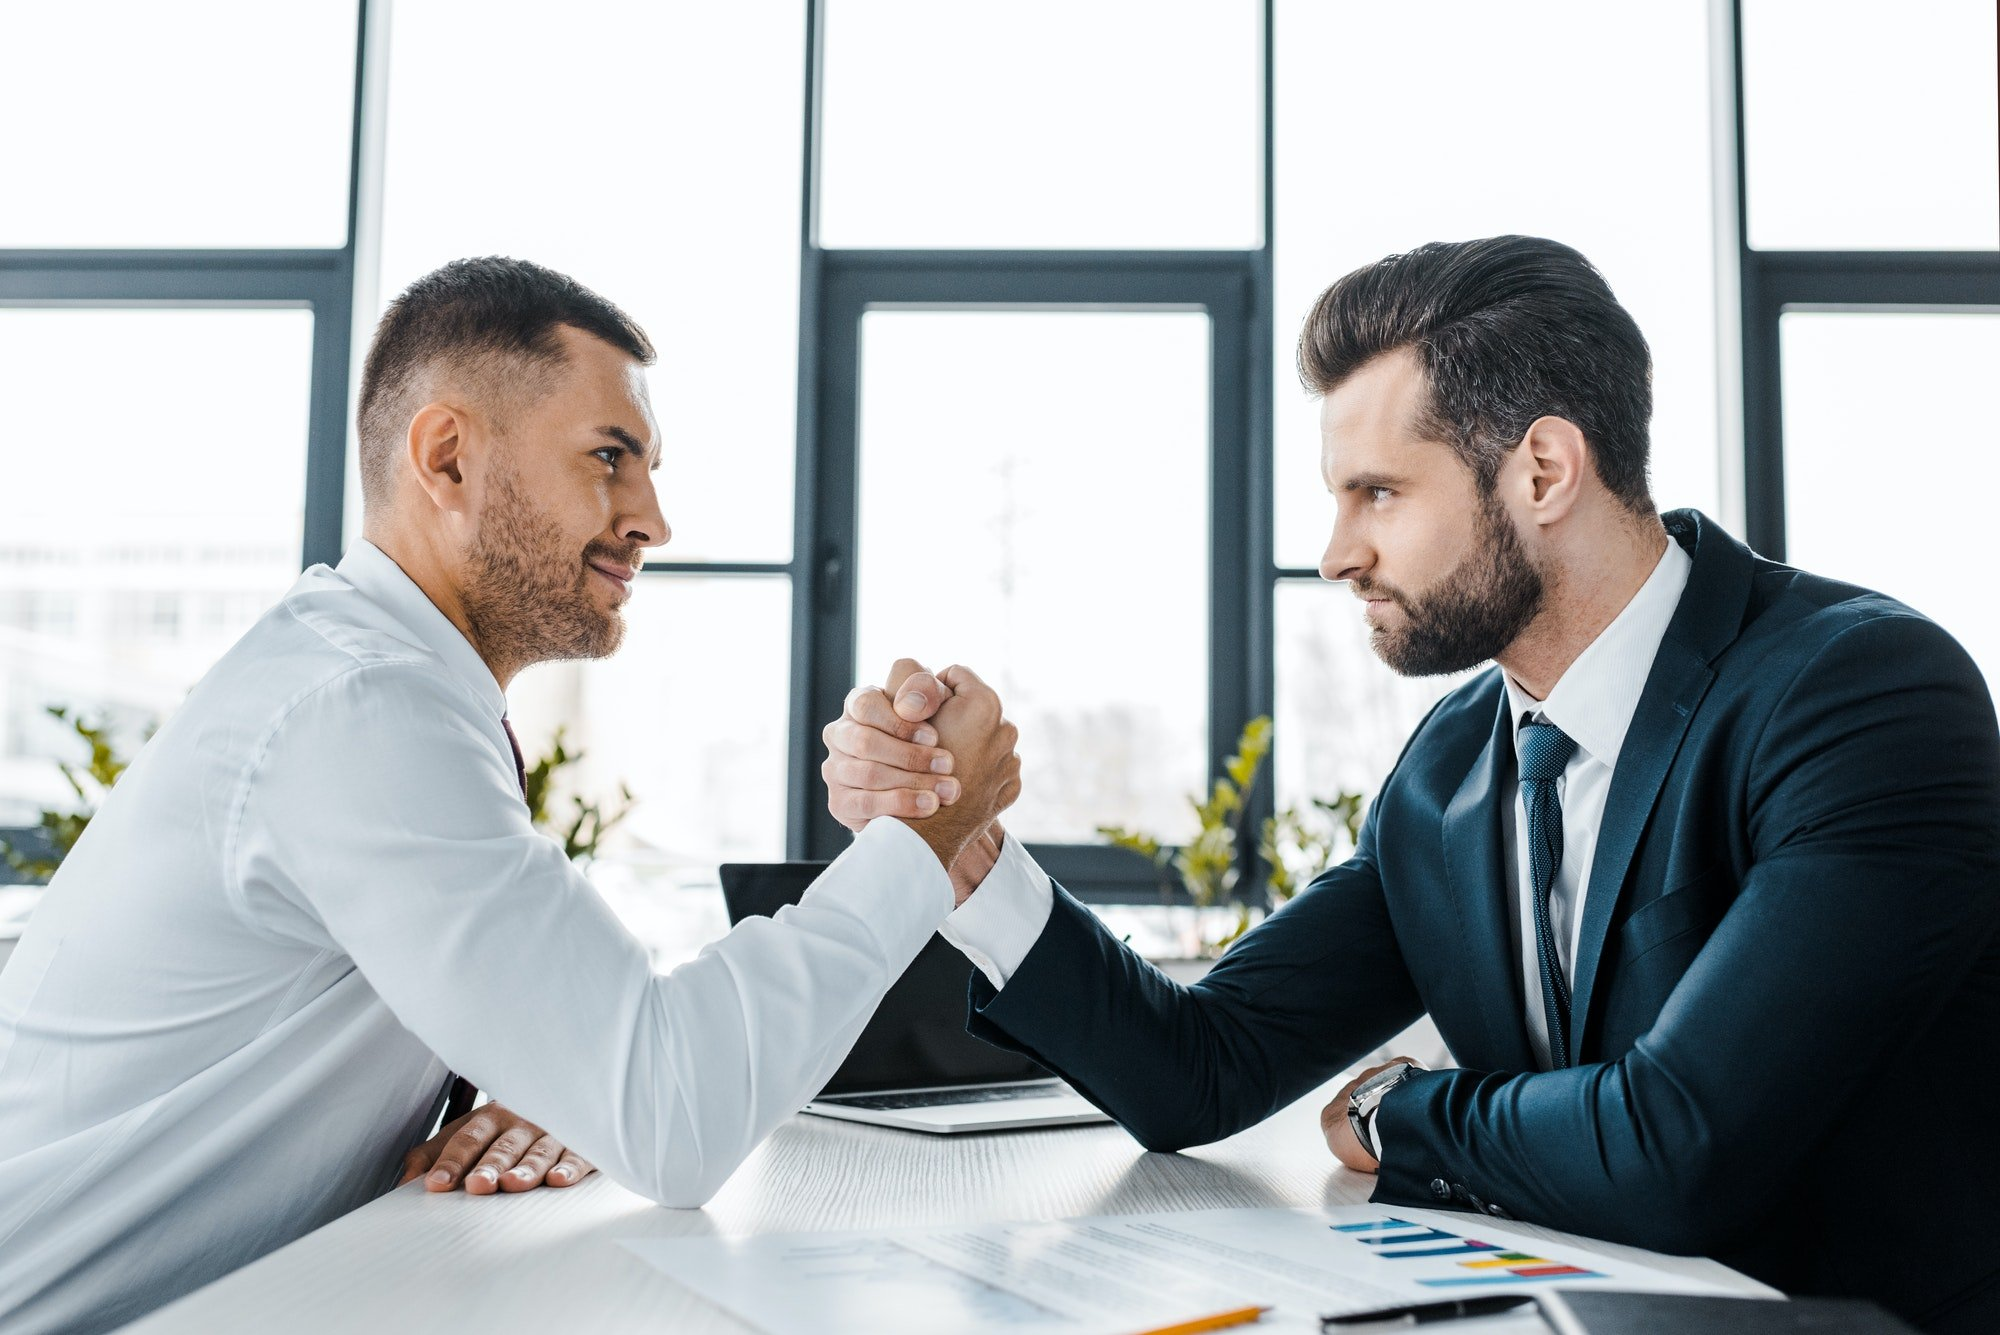 handsome businessmen competing arm wrestling in modern office